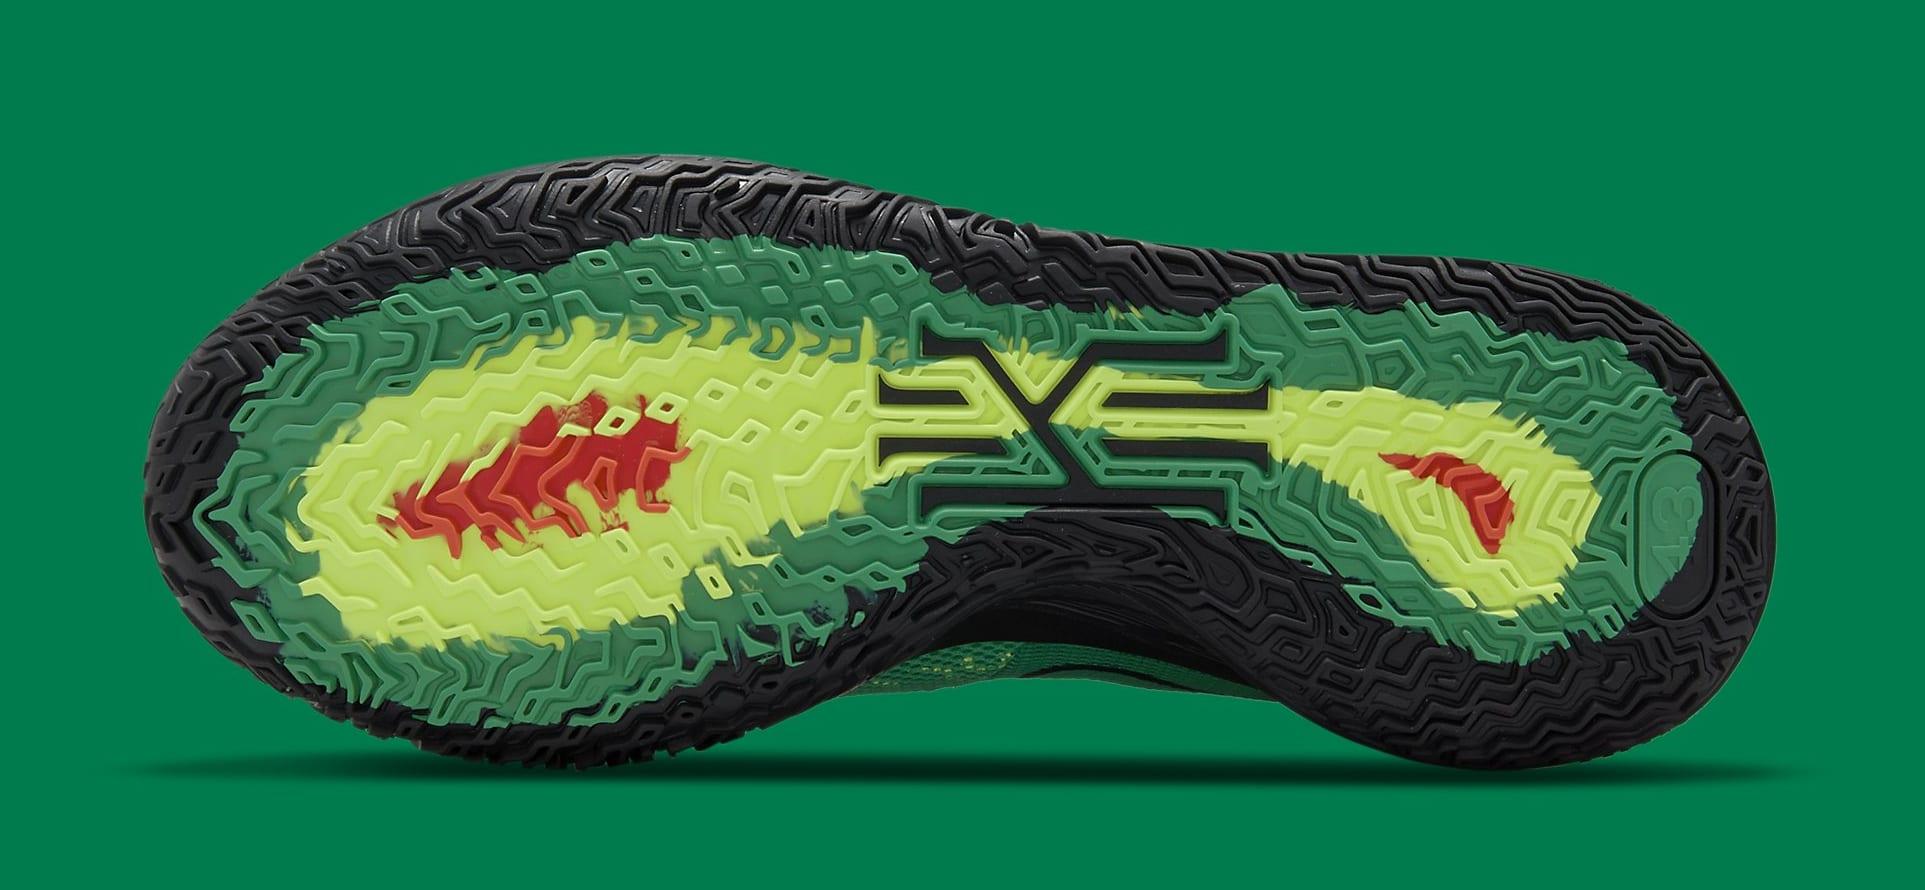 Nike Kyrie 7 'Weatherman' CQ9327-300 Outsole